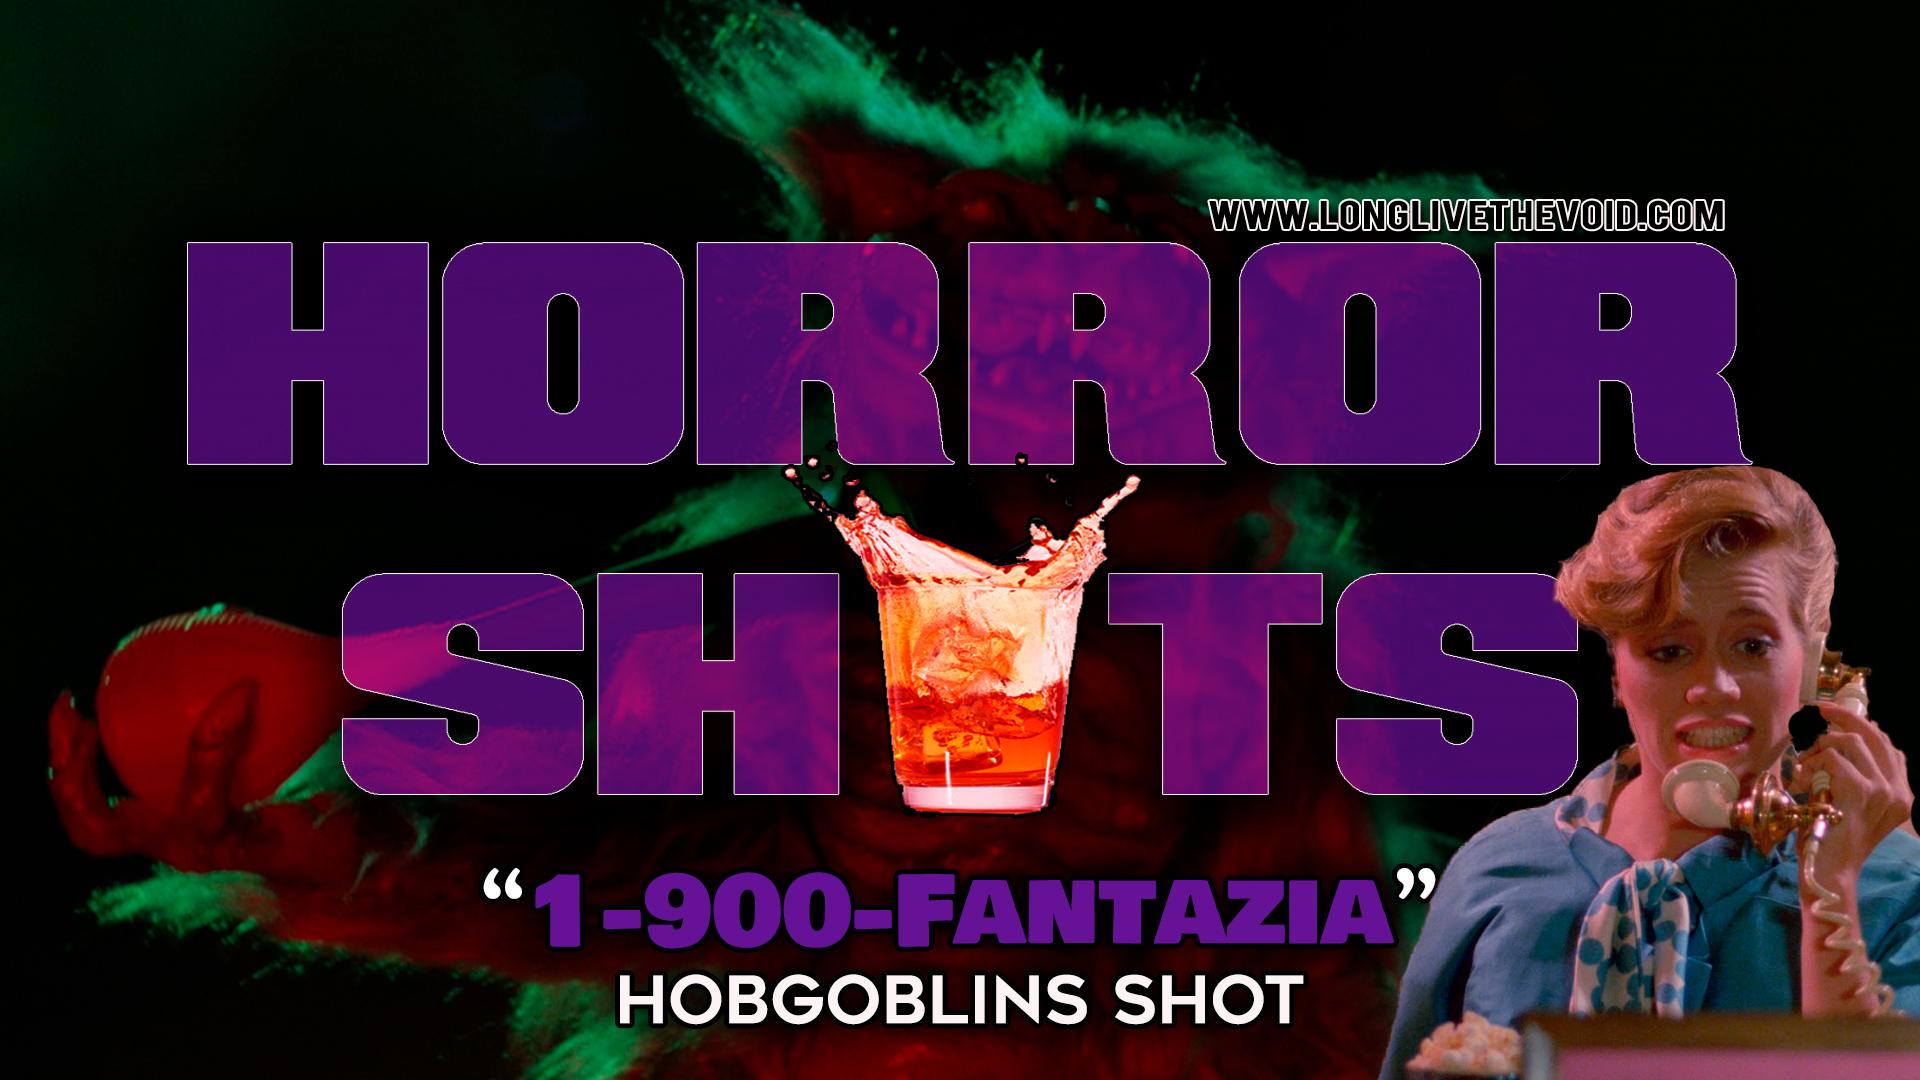 Fantazia-Hobgoblins-SHOT.jpg